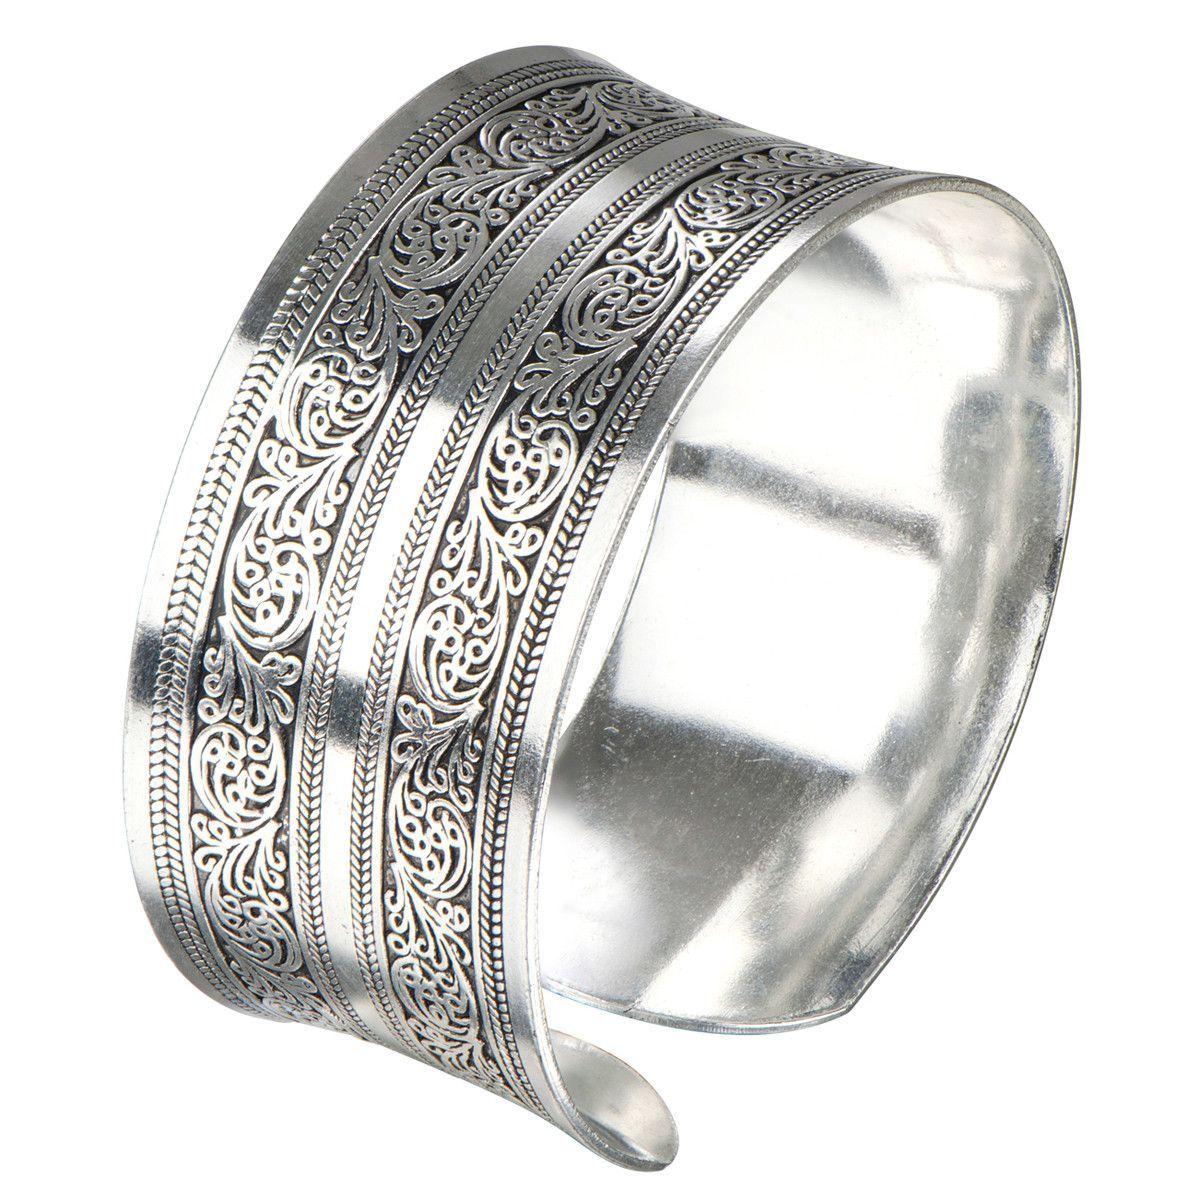 Kanya's Silver Filigree Tribal Vintage Cuff Bracelet